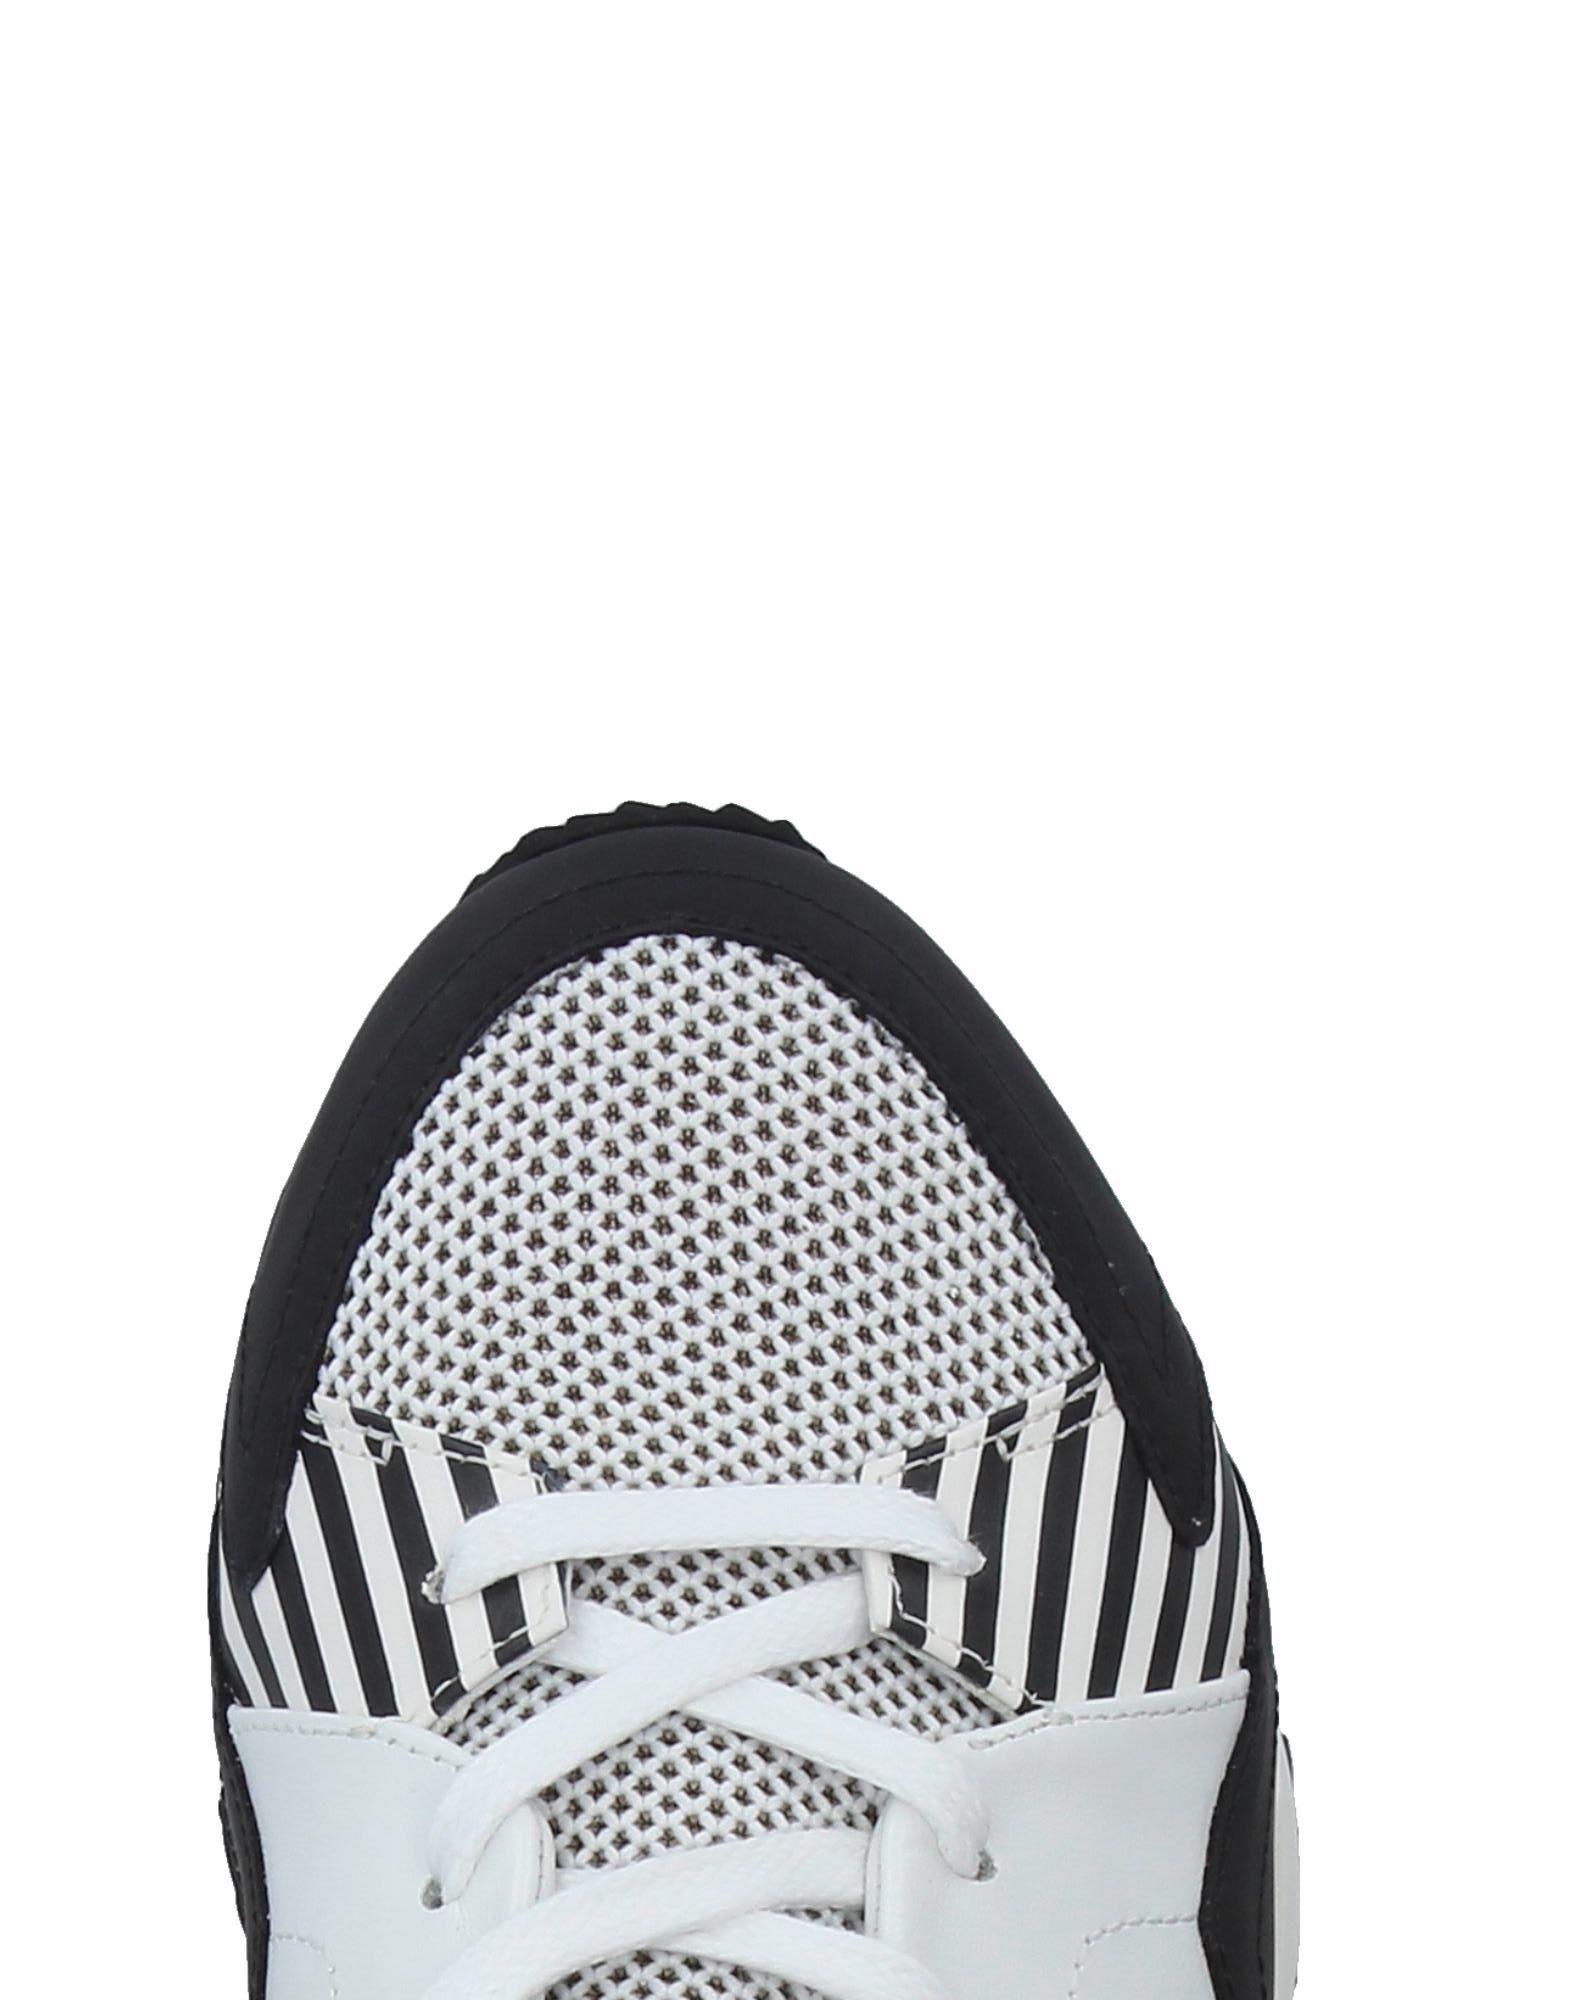 Pierre Hardy Gute Sneakers Herren  11375309UN Gute Hardy Qualität beliebte Schuhe 0d9e9c